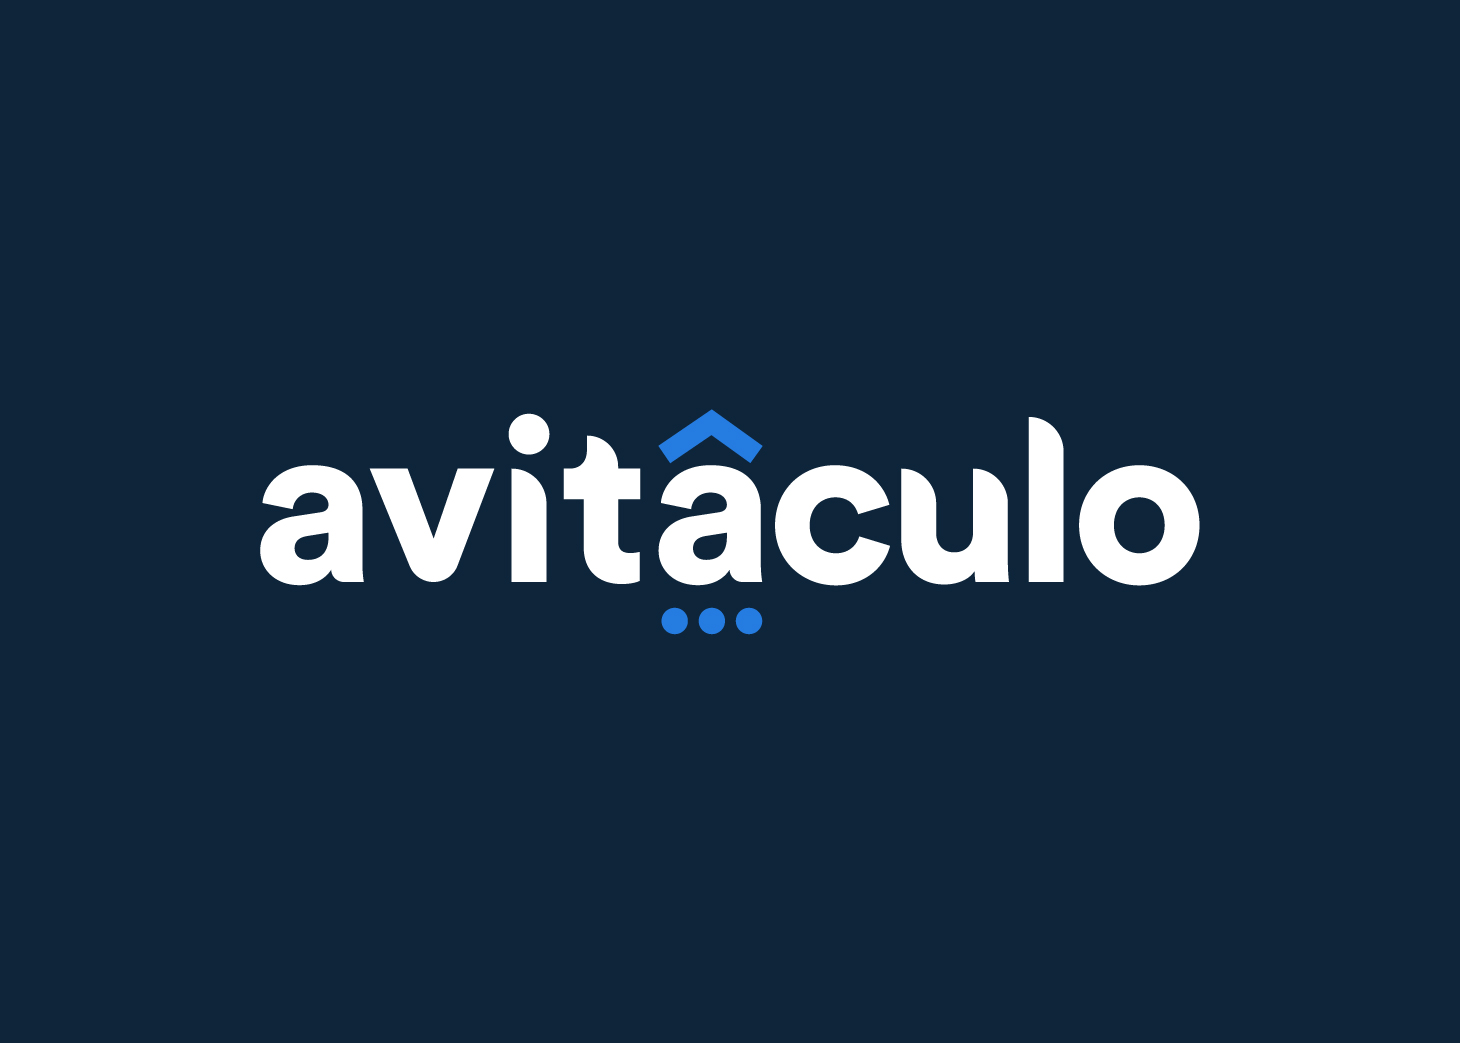 logotipo-avitaculo-inmobiliaria-2